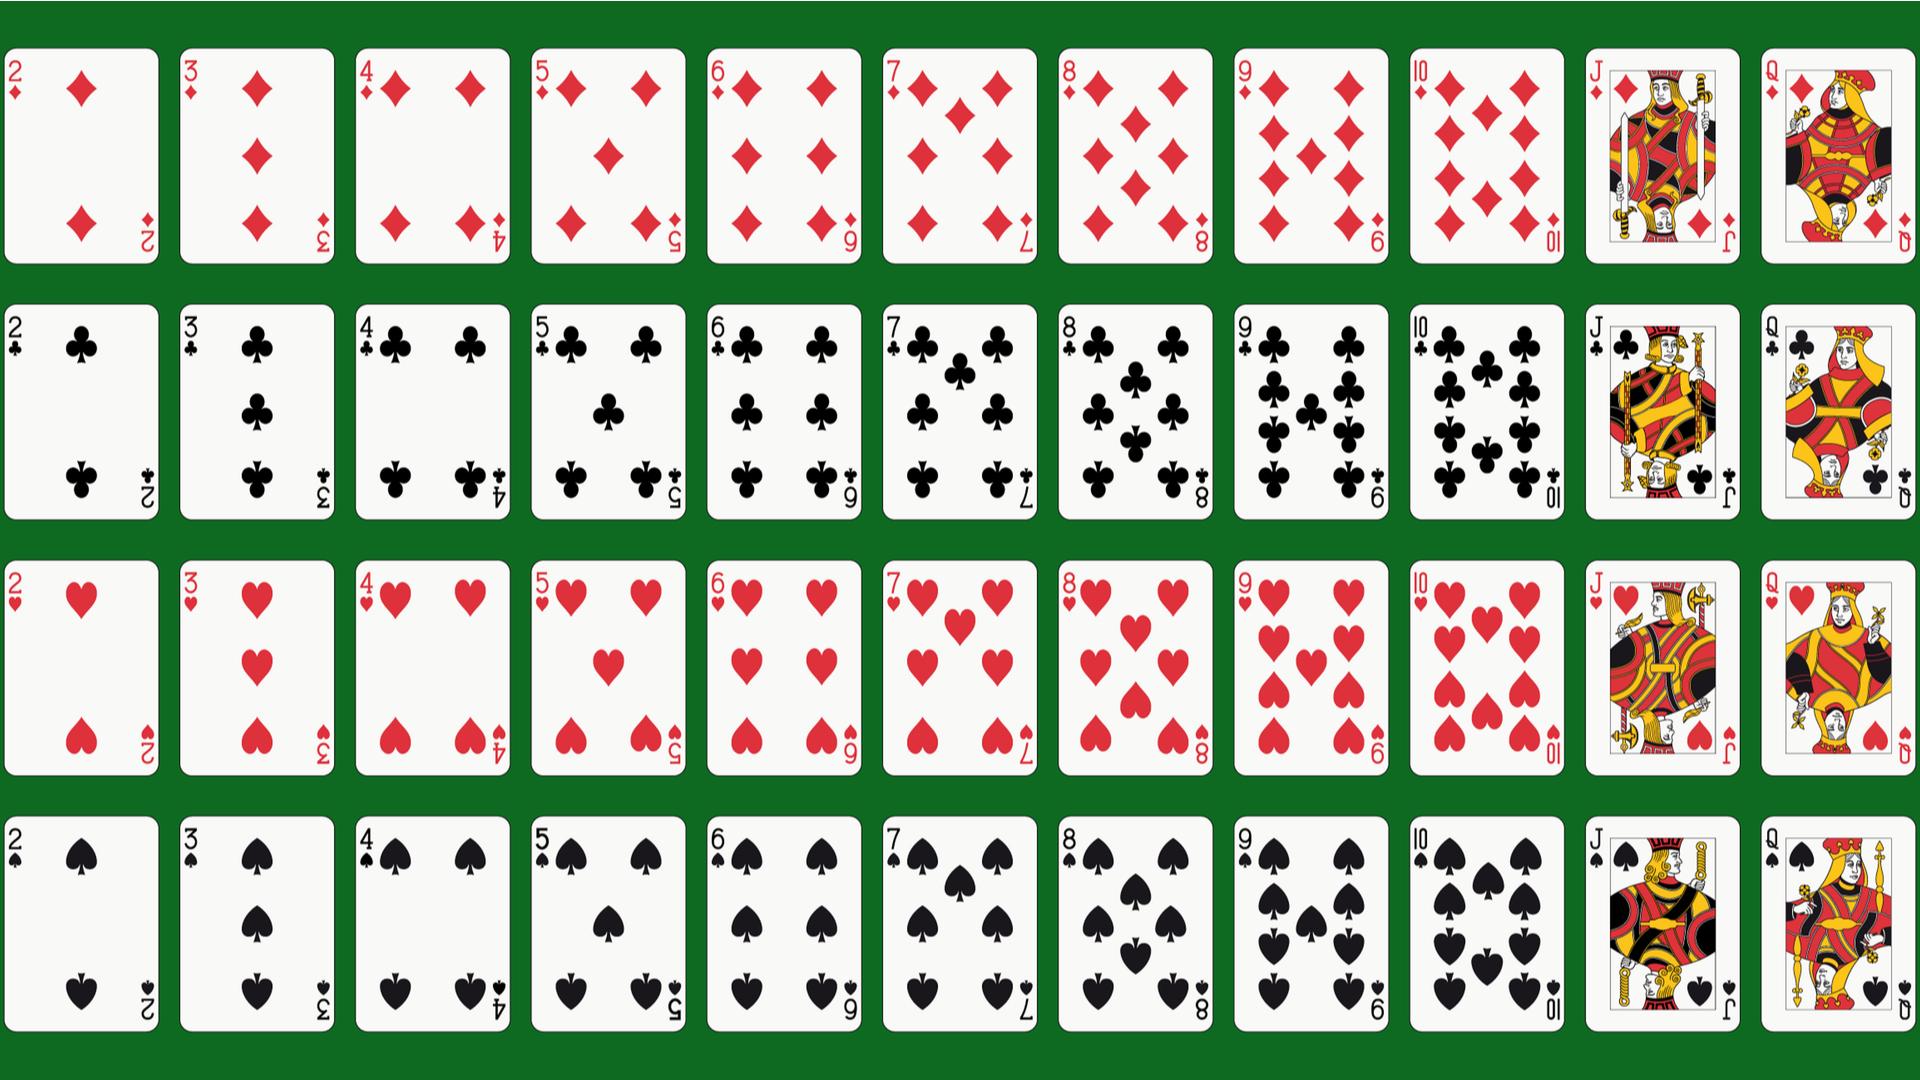 Aprende A Leer Las Cartas Del Póker Horóscopos Univision